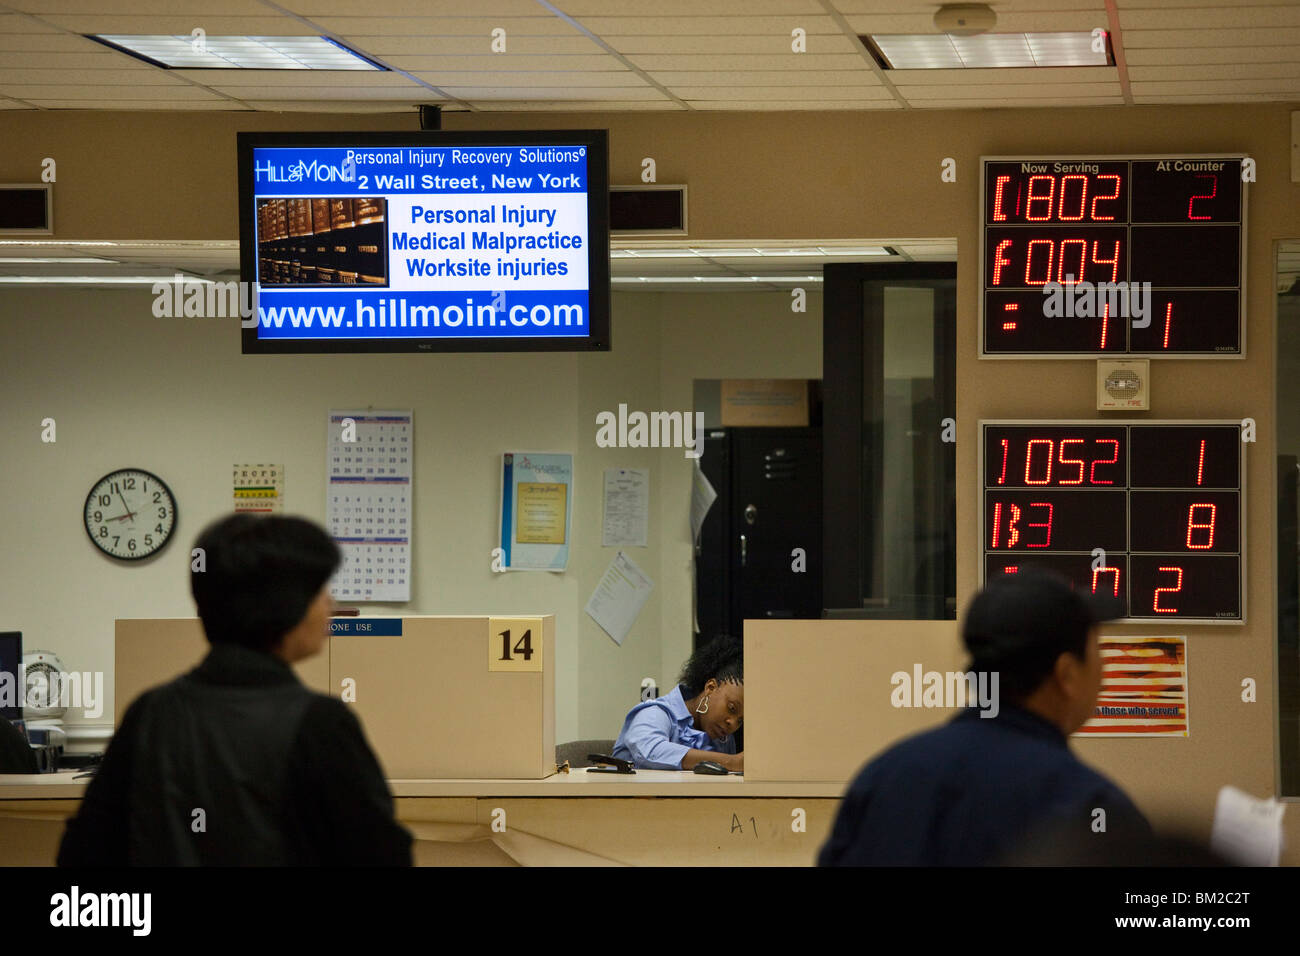 DMV Department of Motor Vehicle in lower Manhattan, New York City - Stock Image